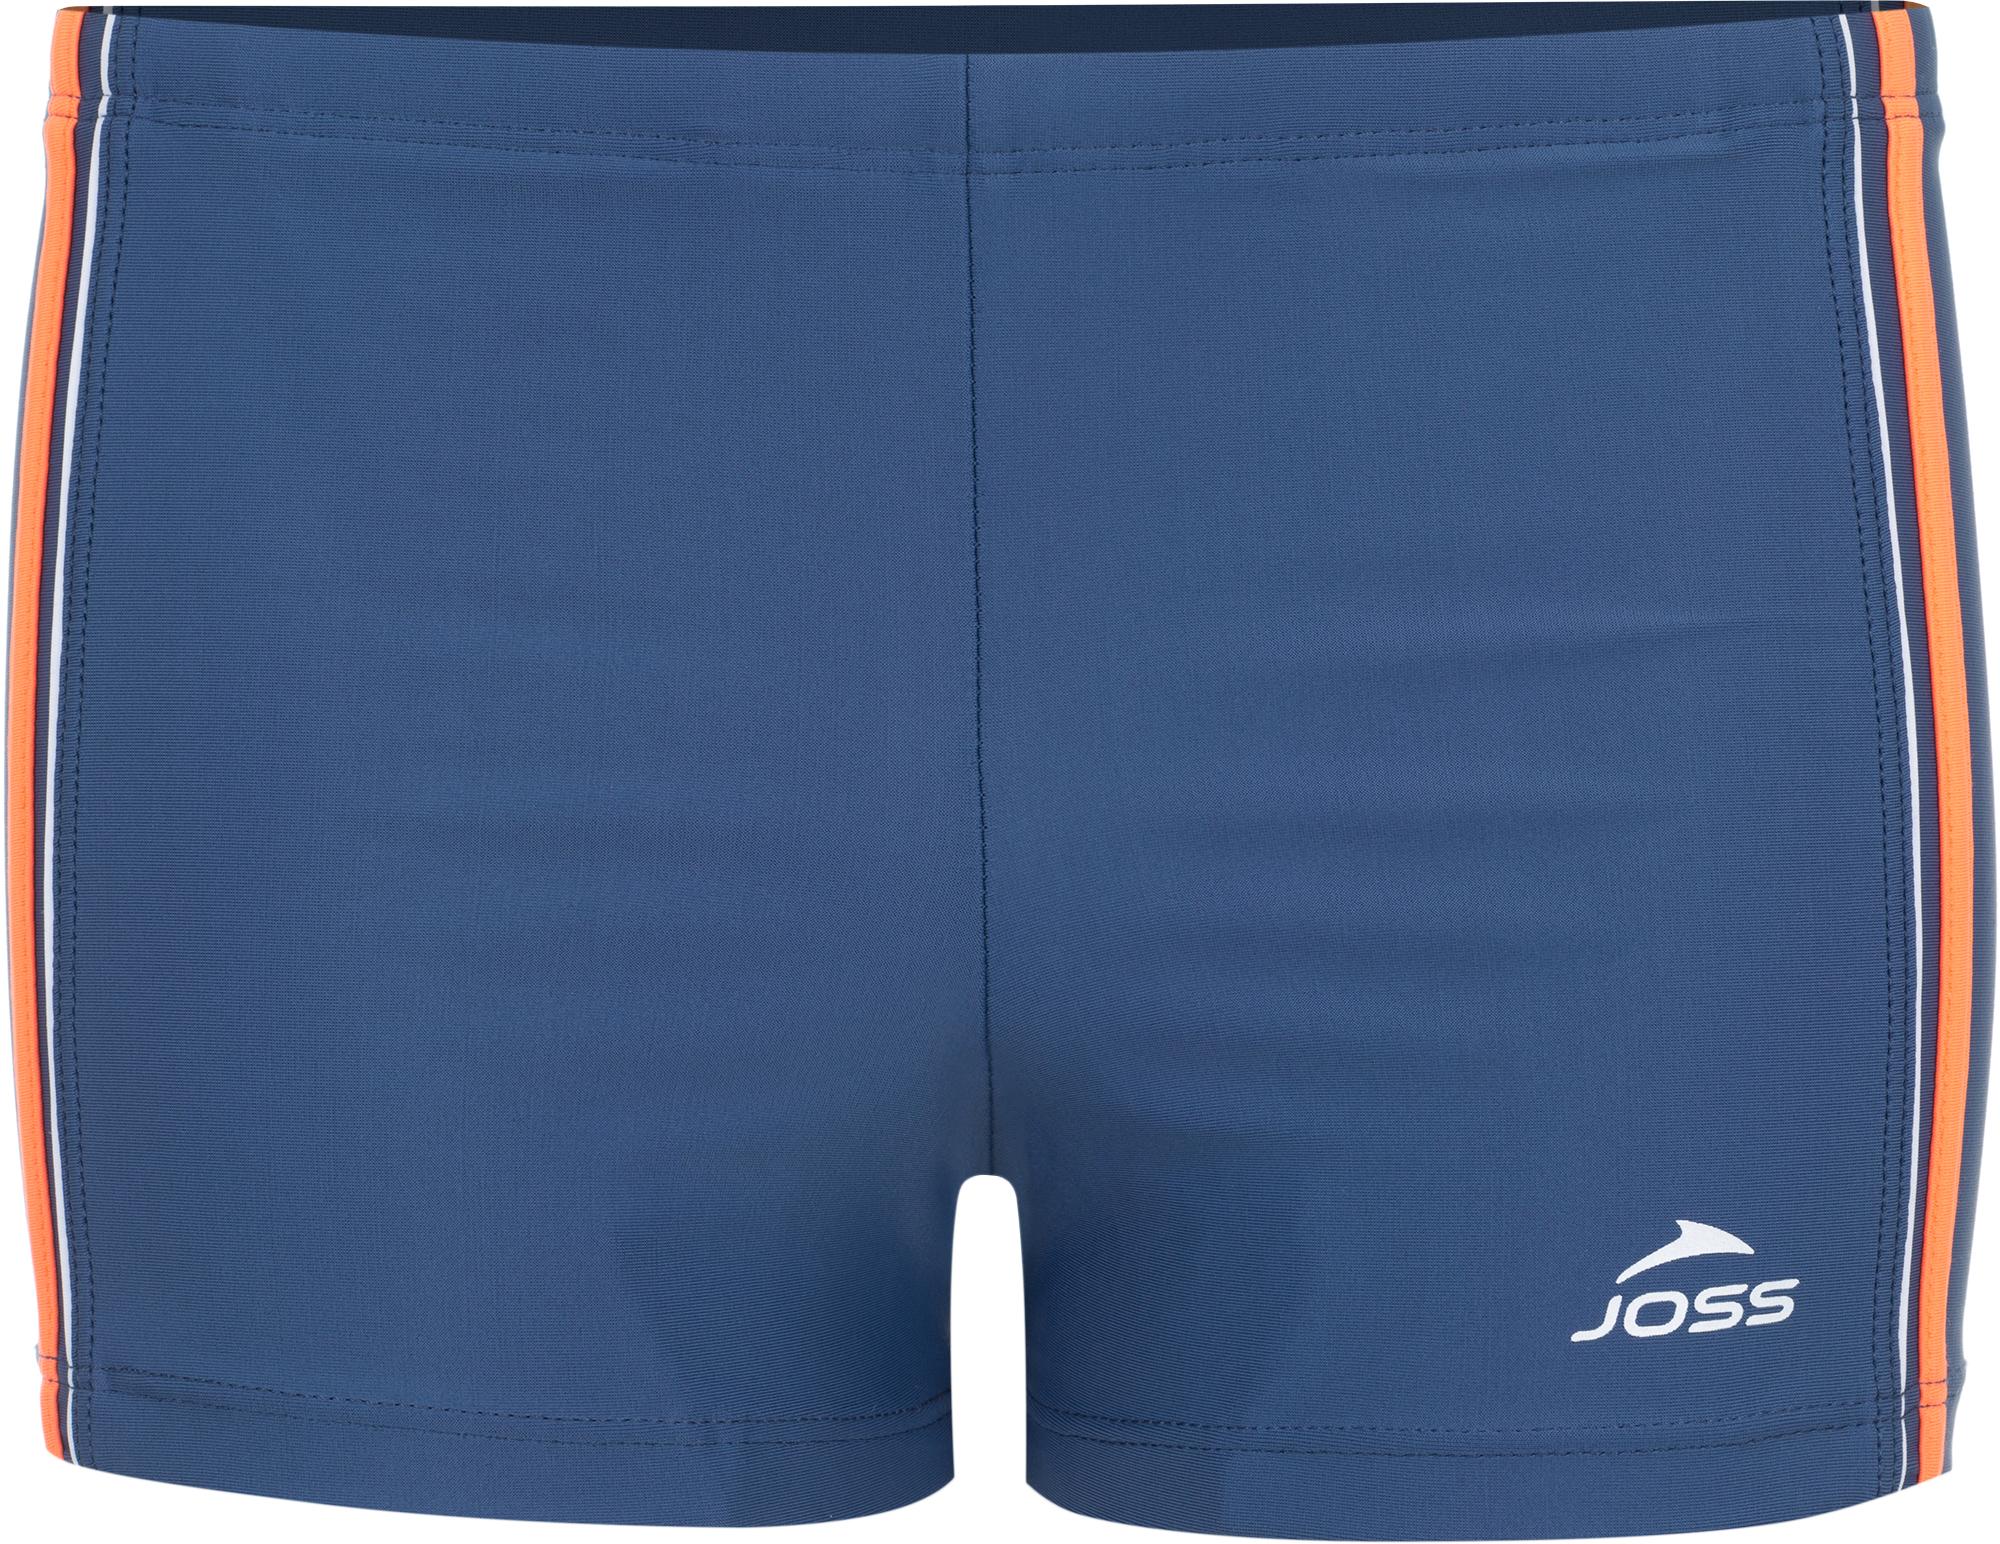 Joss Плавки-шорты для мальчиков Joss, размер 152